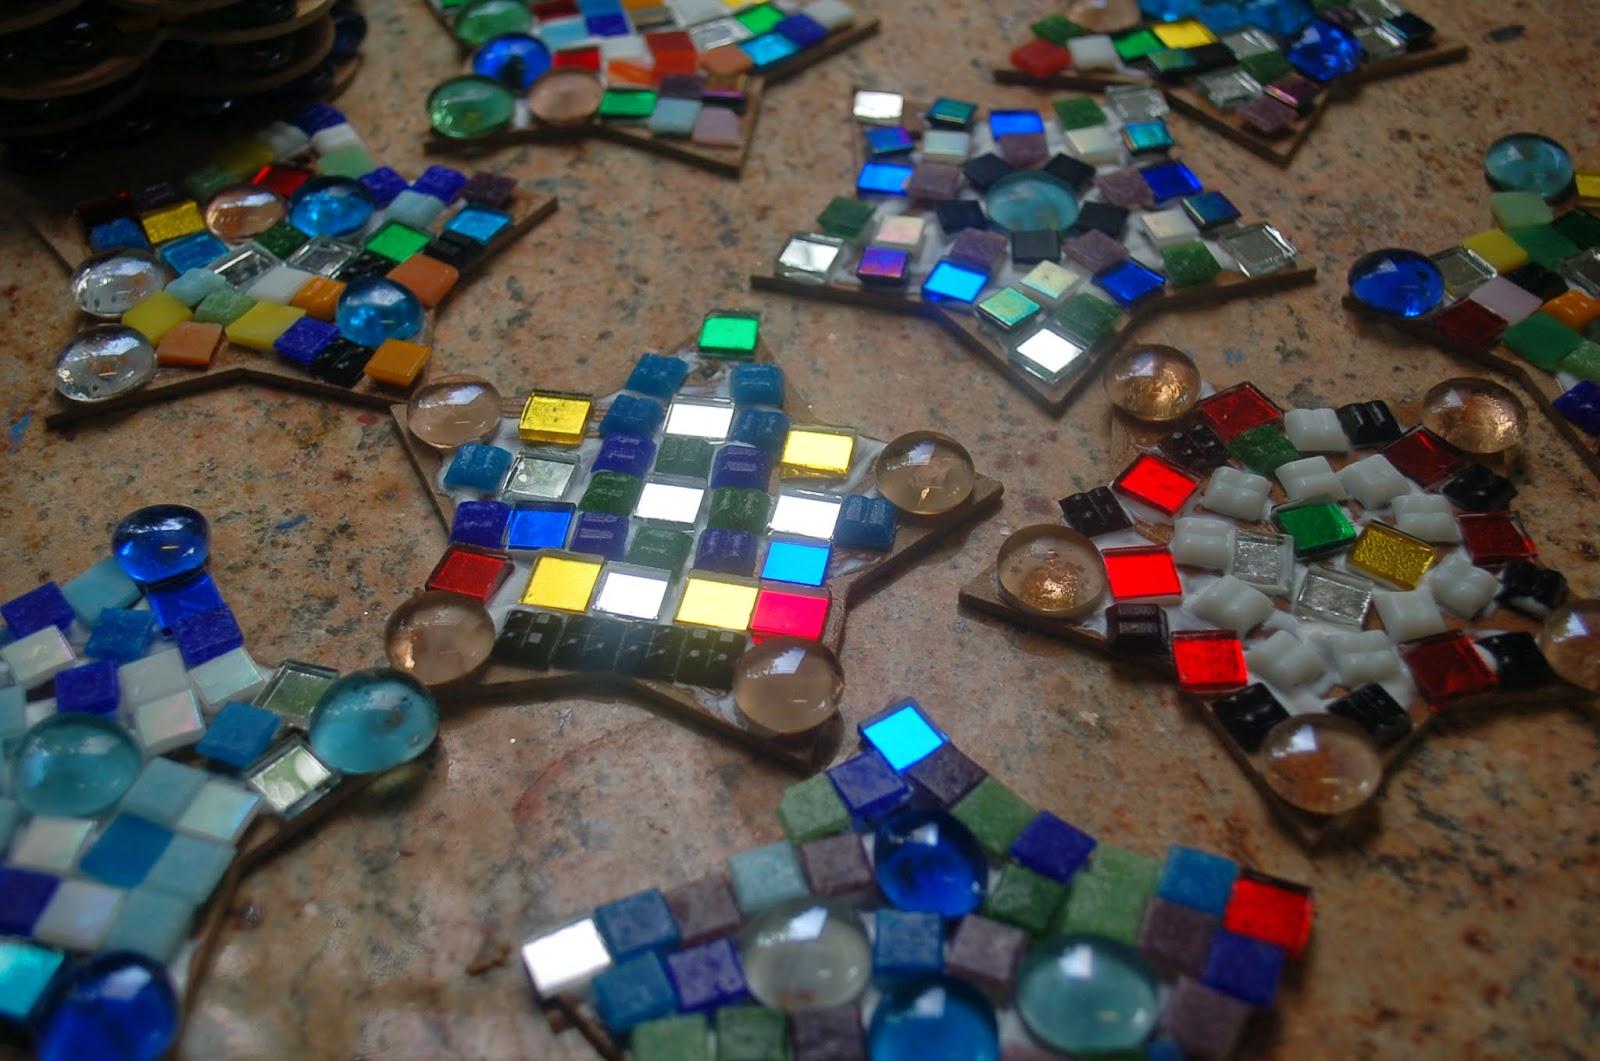 sunnyside art house mini mosaic stars and flowers. Black Bedroom Furniture Sets. Home Design Ideas